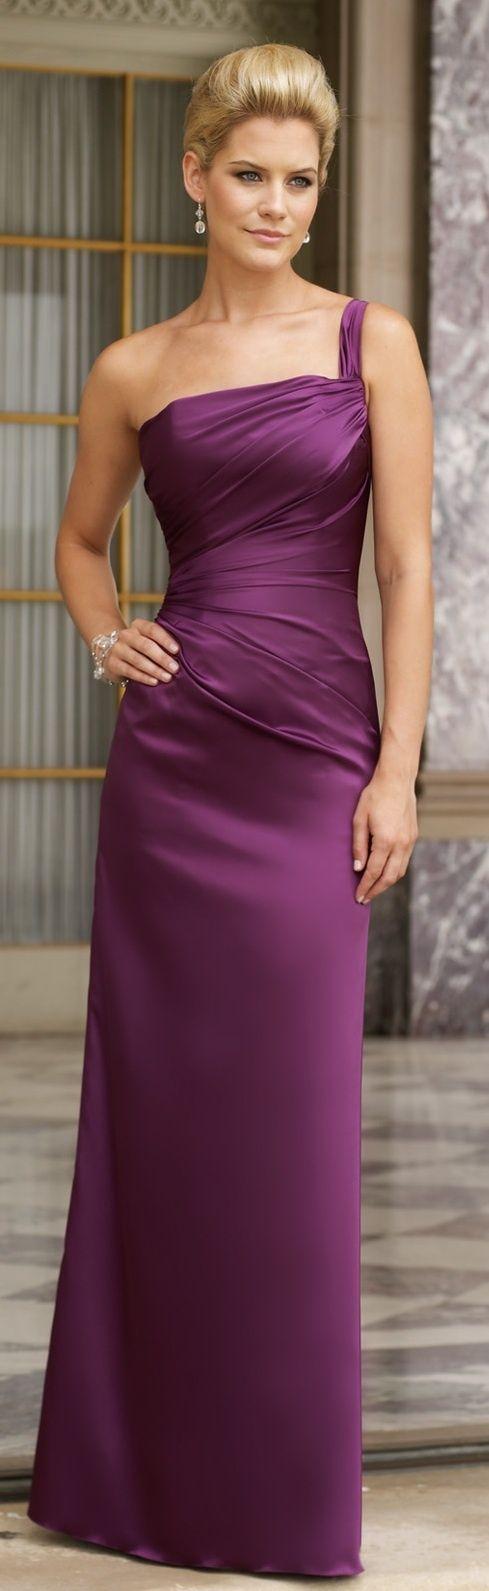 Sophia Tolli 2013 | VESTIDOS TONOS CLAROS | Pinterest | Vestidos de ...